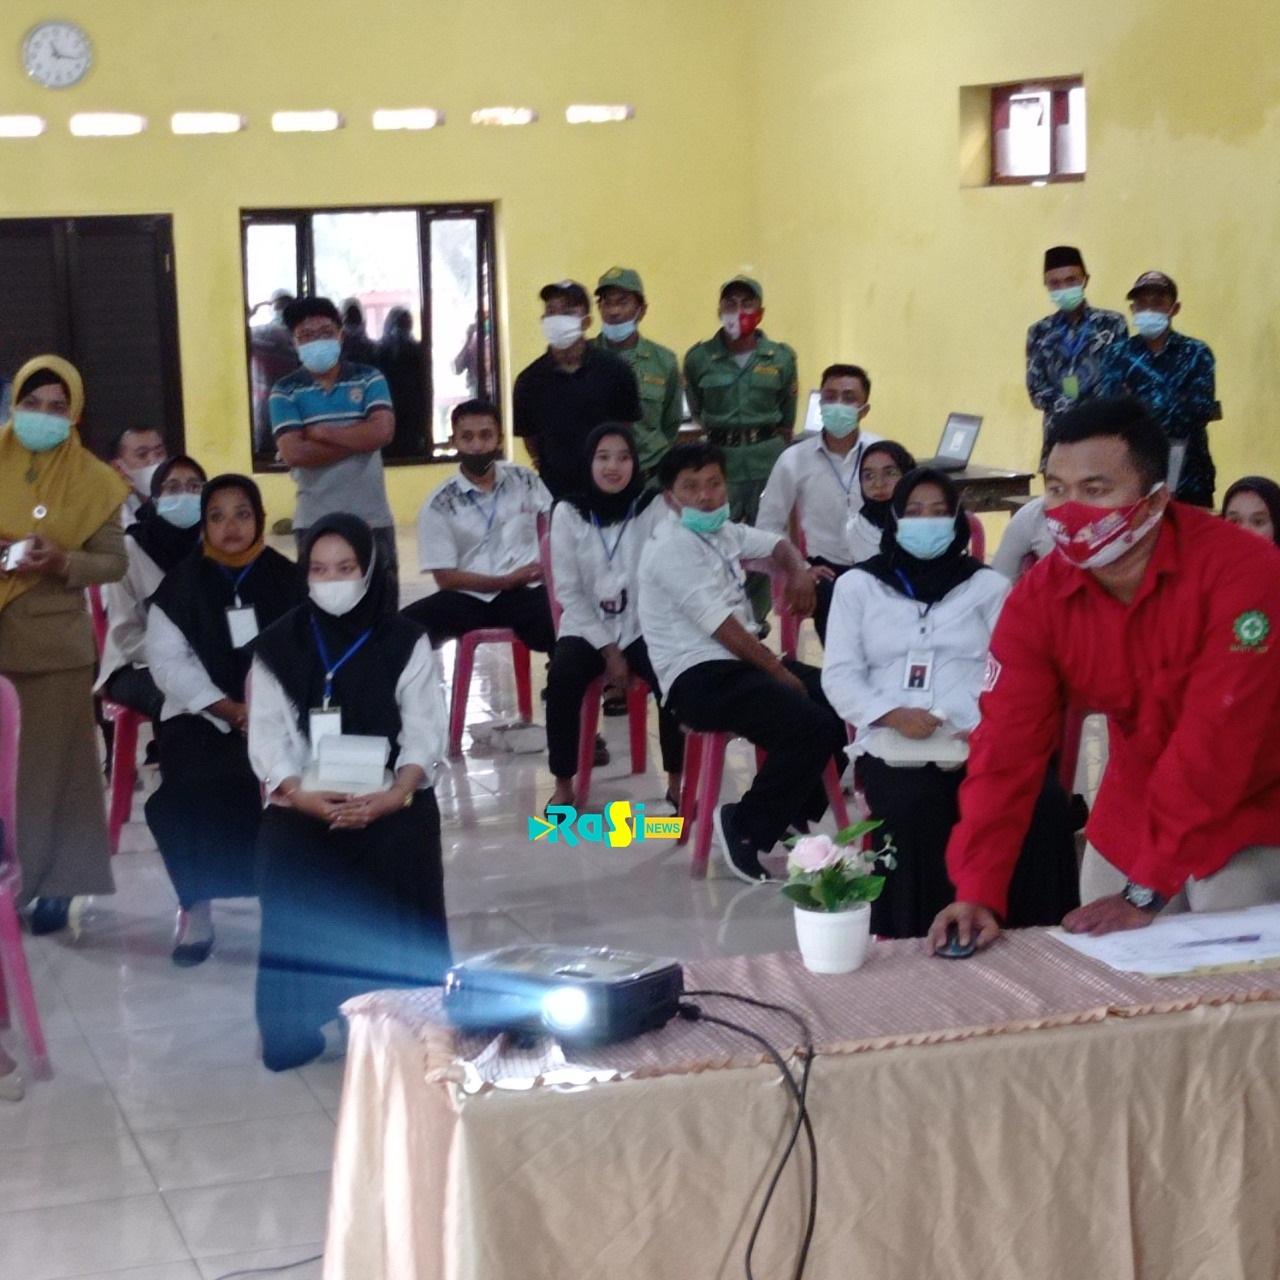 Gandeng STM YKP, Pemdes Sukowidi Gelar Test Perangkat Desa.